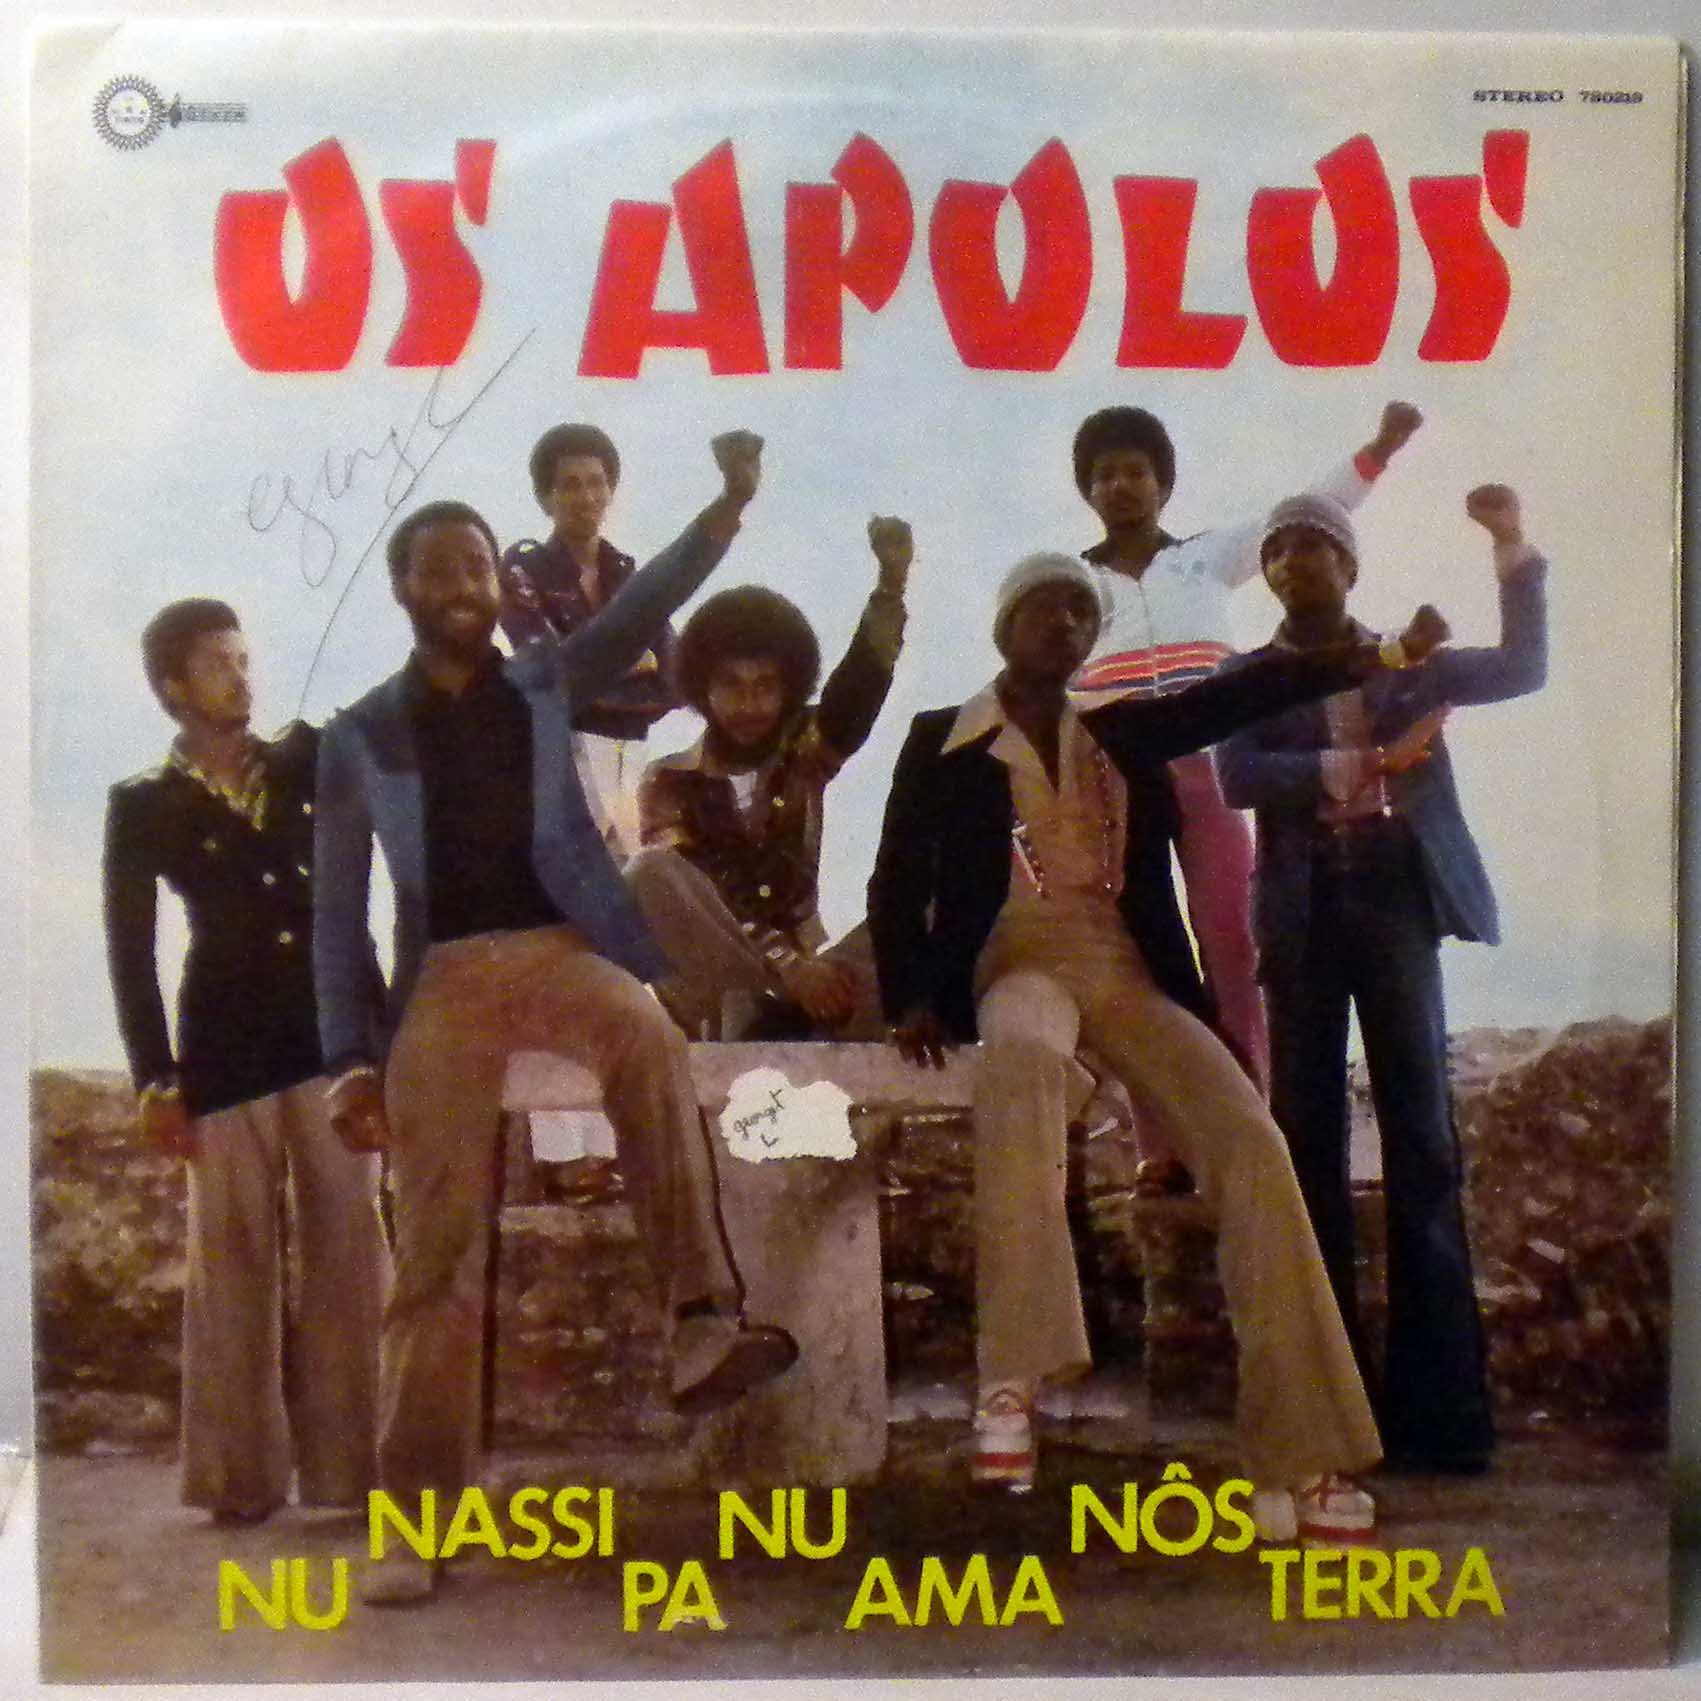 OS APOLOS - Nu nassi pa nu ama nos terra - LP